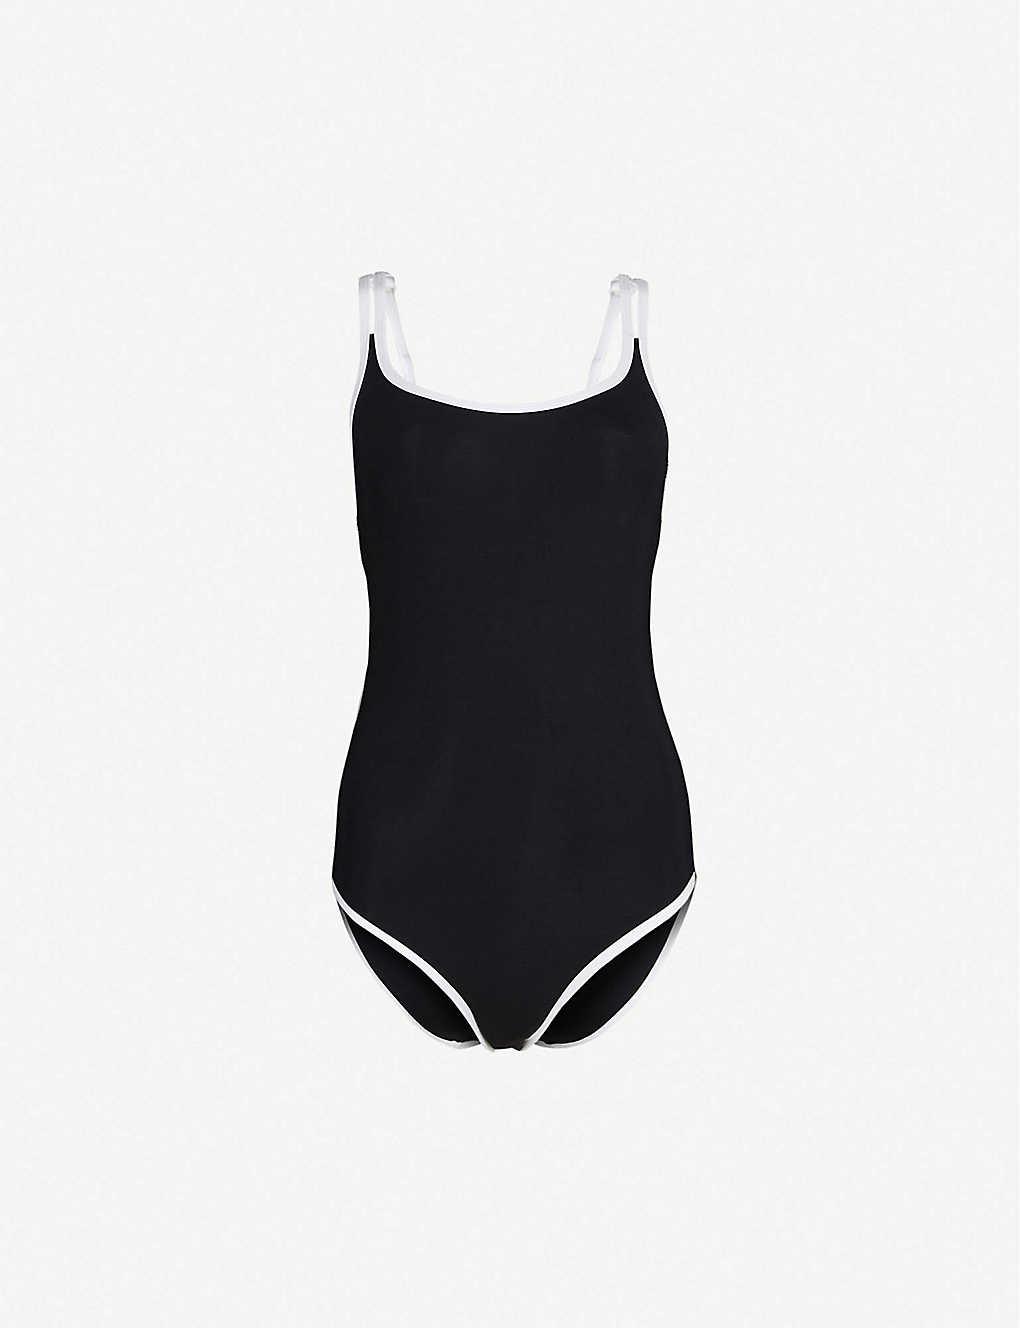 38efa5b9a4 JETS BY JESSIKA ALLEN - Double-strap scoop-neck swimsuit ...